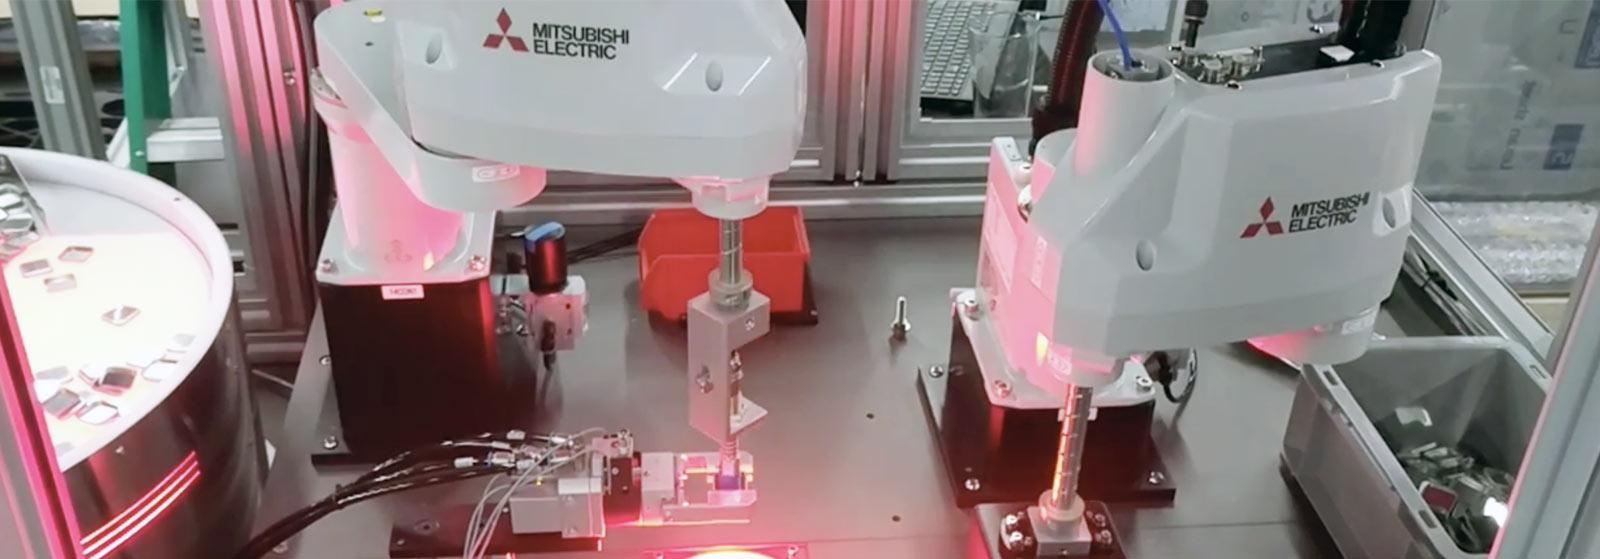 Mitsubishi Robotics Arm